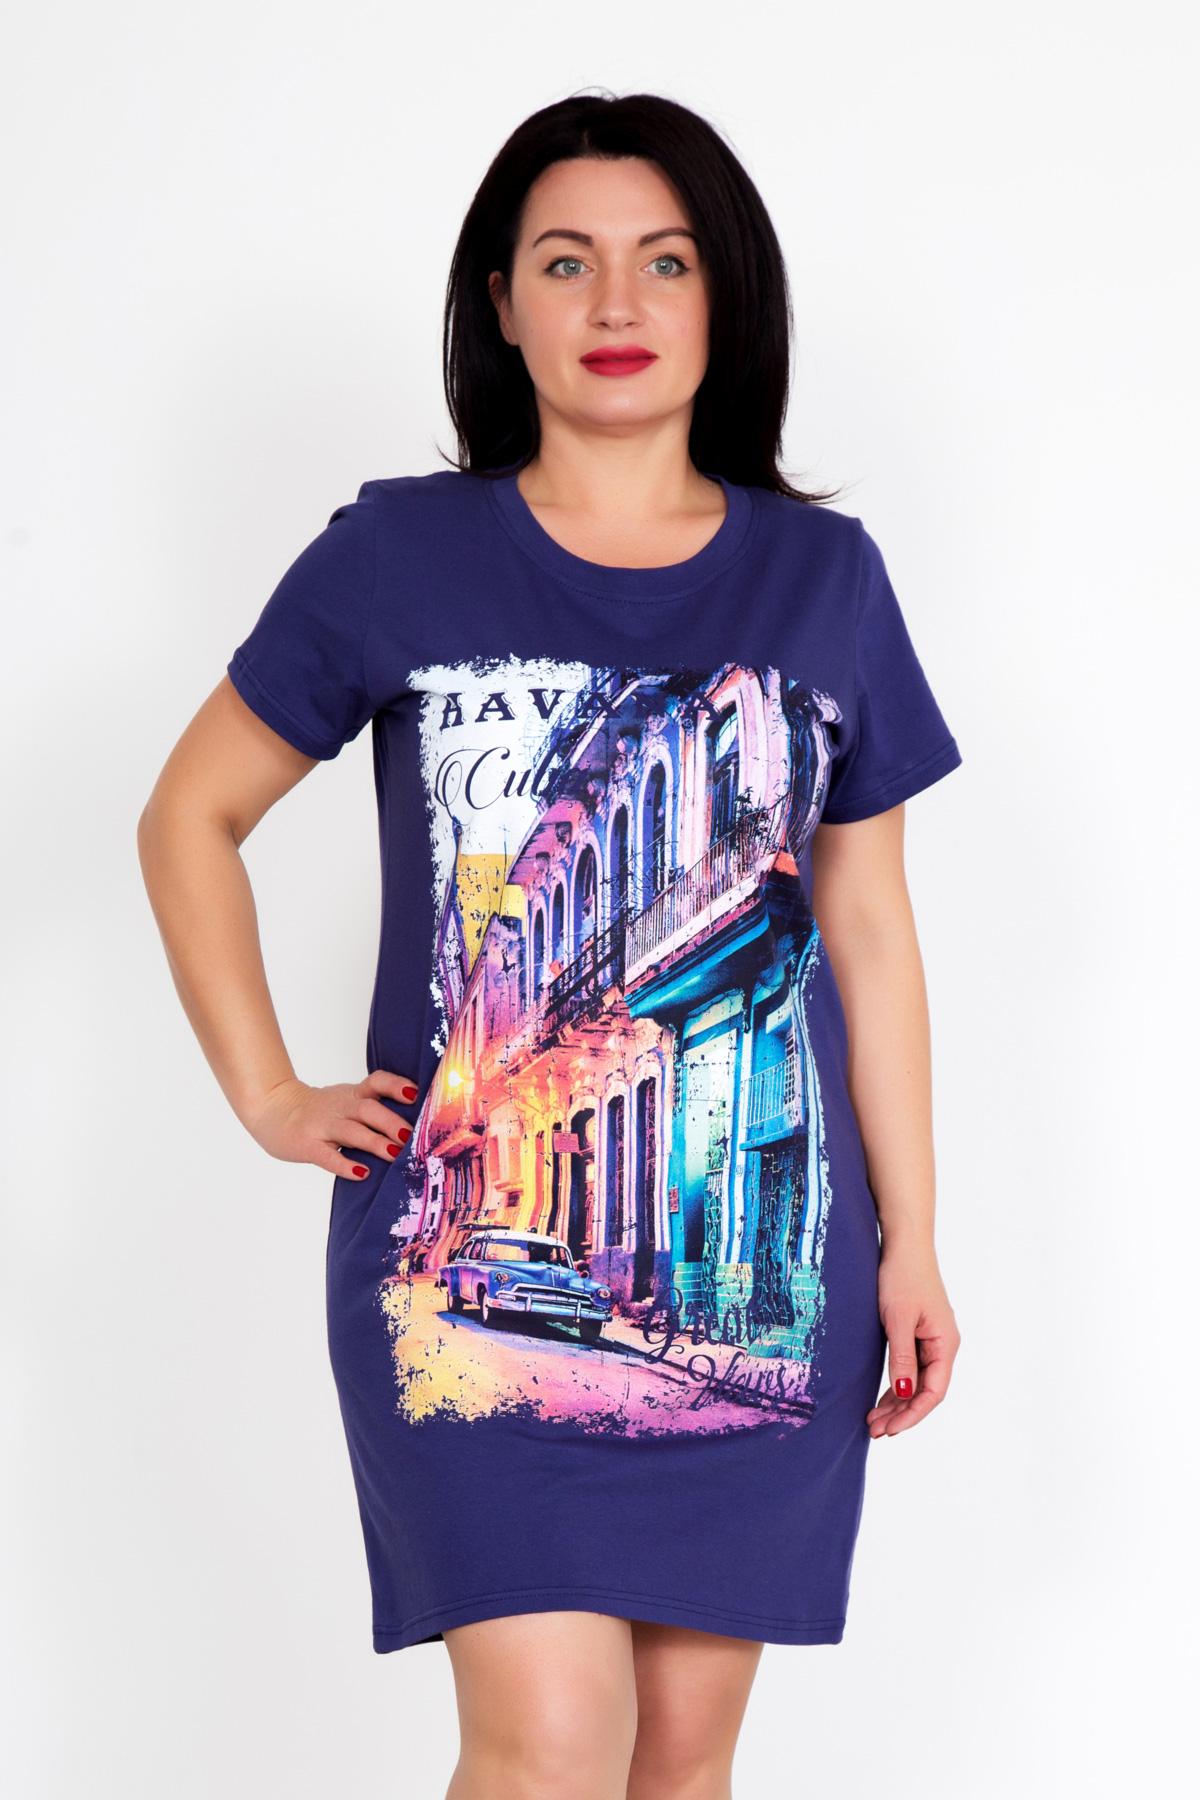 Жен. платье Куба р. 54Платья<br>Факт. ОГ: 110 см <br>Факт. ОТ: 106 см <br>Факт. ОБ: 92 см <br>Длина по спинке: 91 см<br><br>Тип: Жен. платье<br>Размер: 54<br>Материал: Кулирка